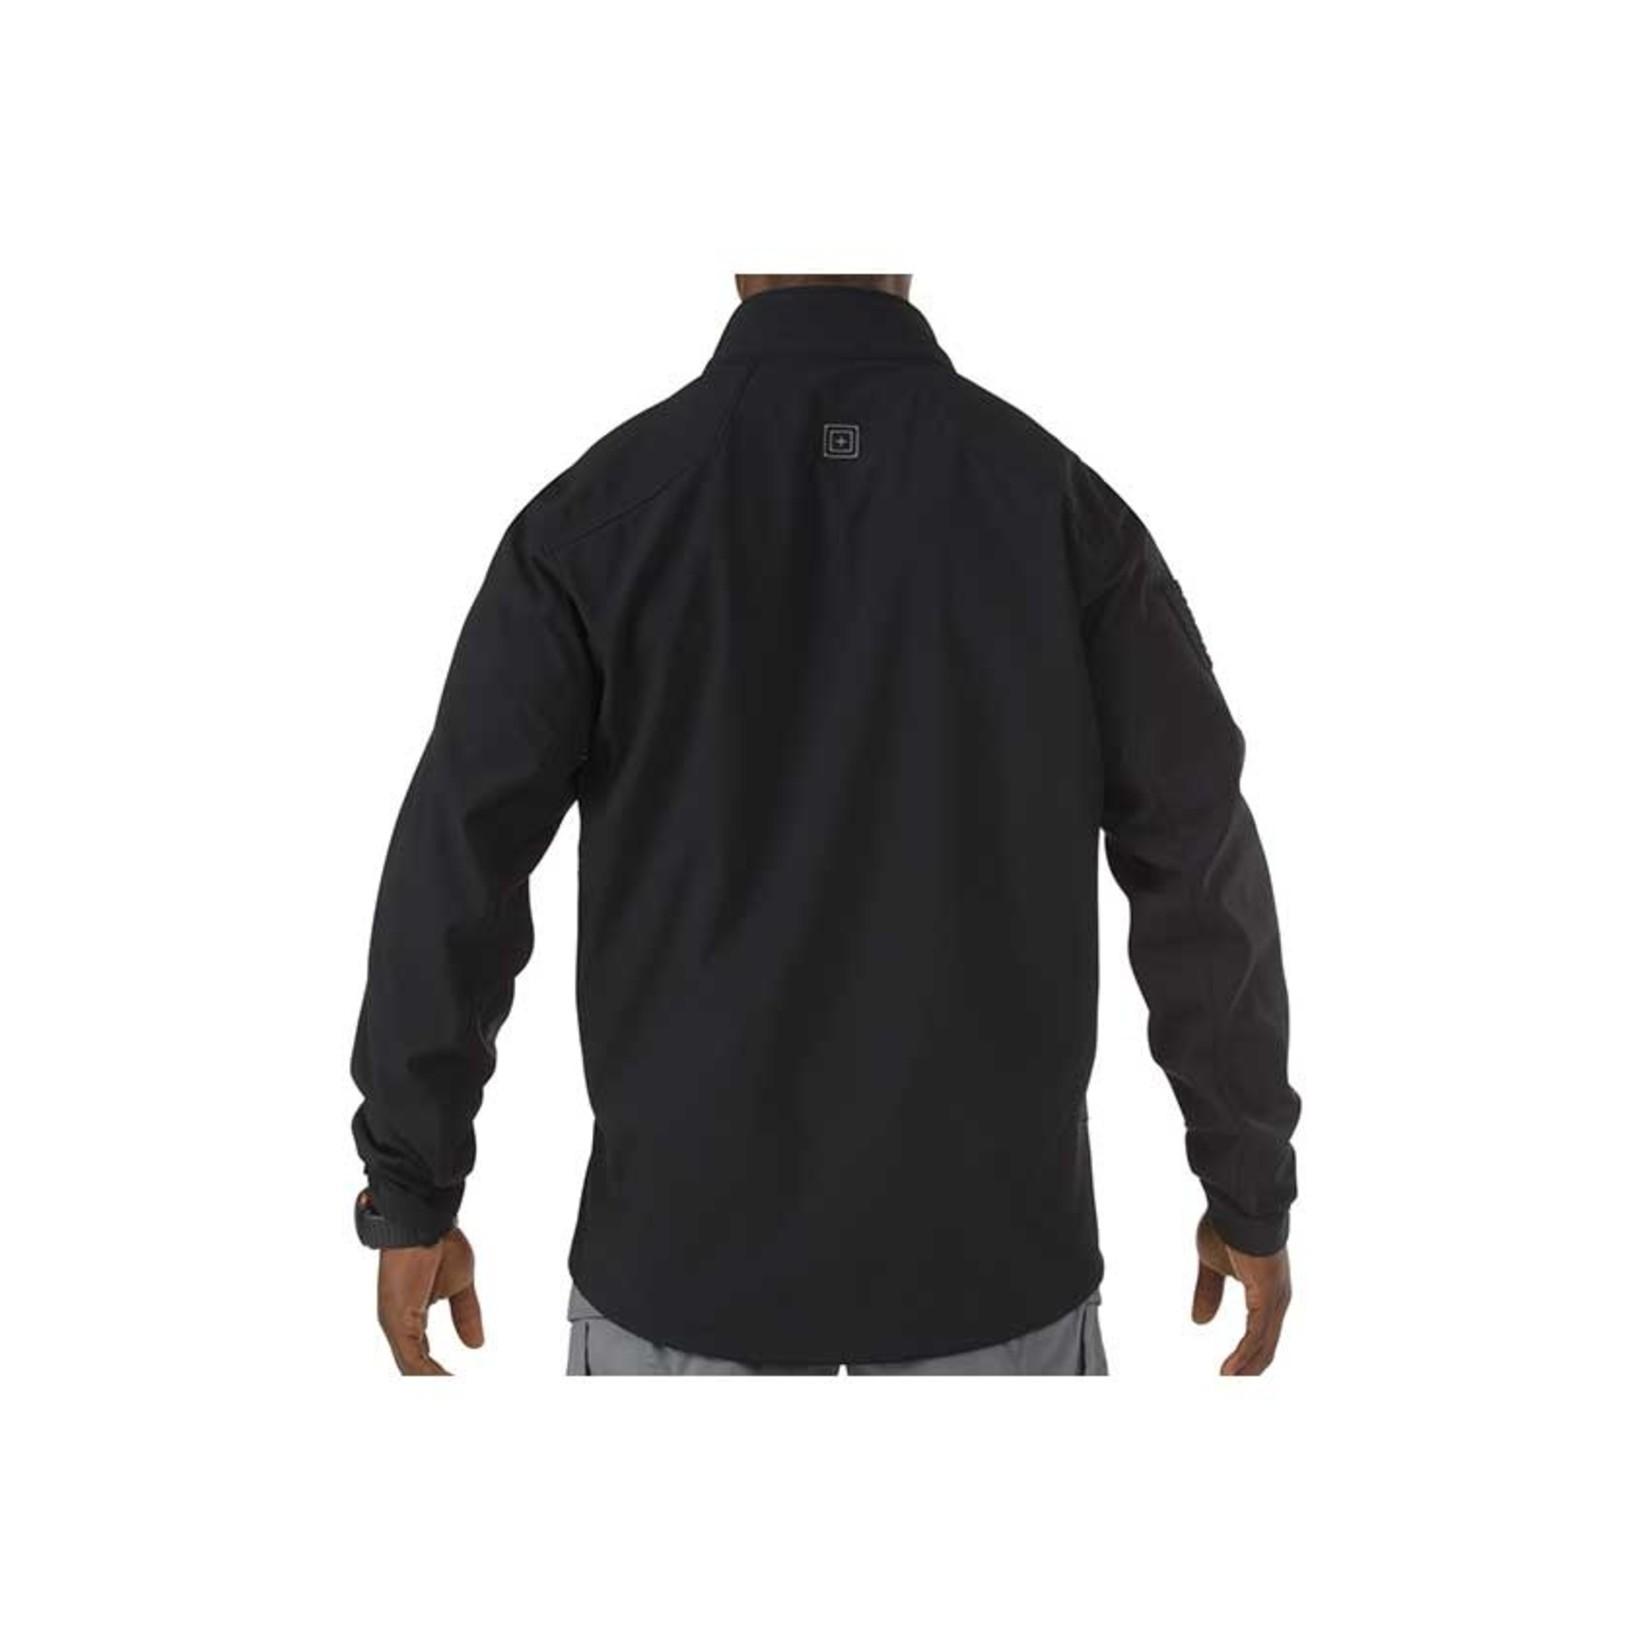 5.11 Tactical 5.11 Men's Sierra Softshell Jacket